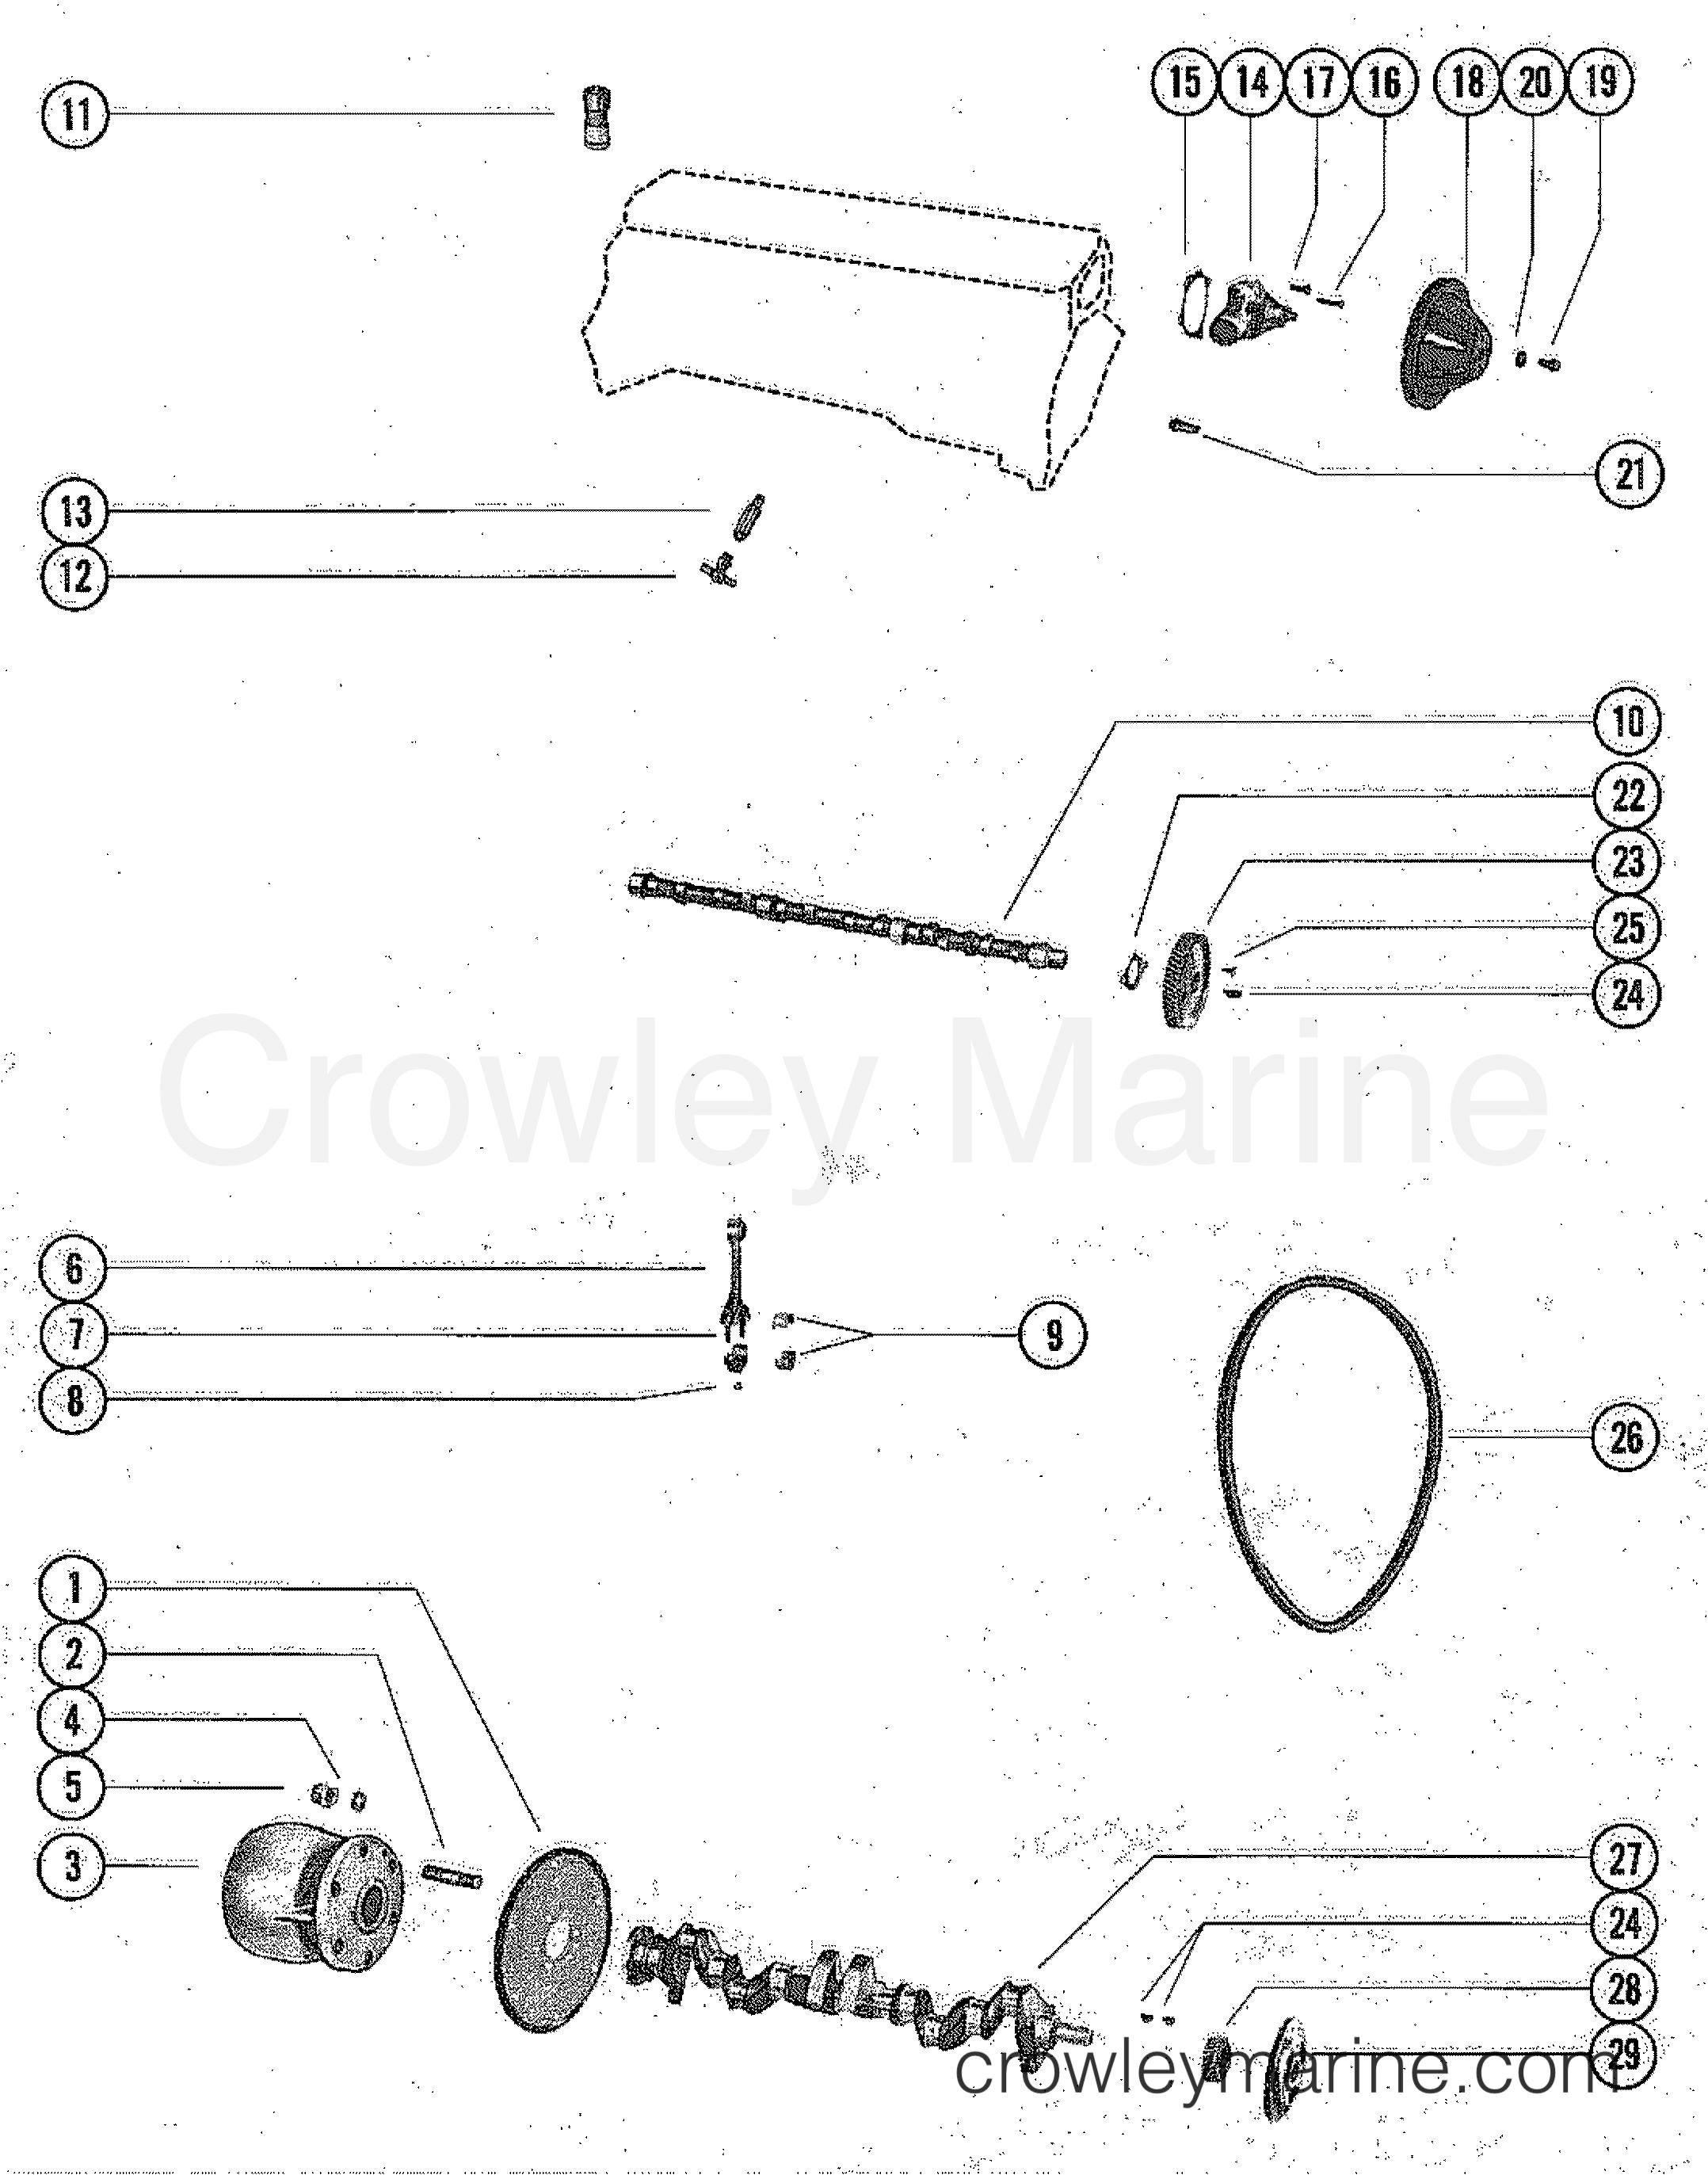 CAMSHAFT  CRANKSHAFT AND WATER PUMP  1978    Mercruiser       165    2165208   Crowley Marine